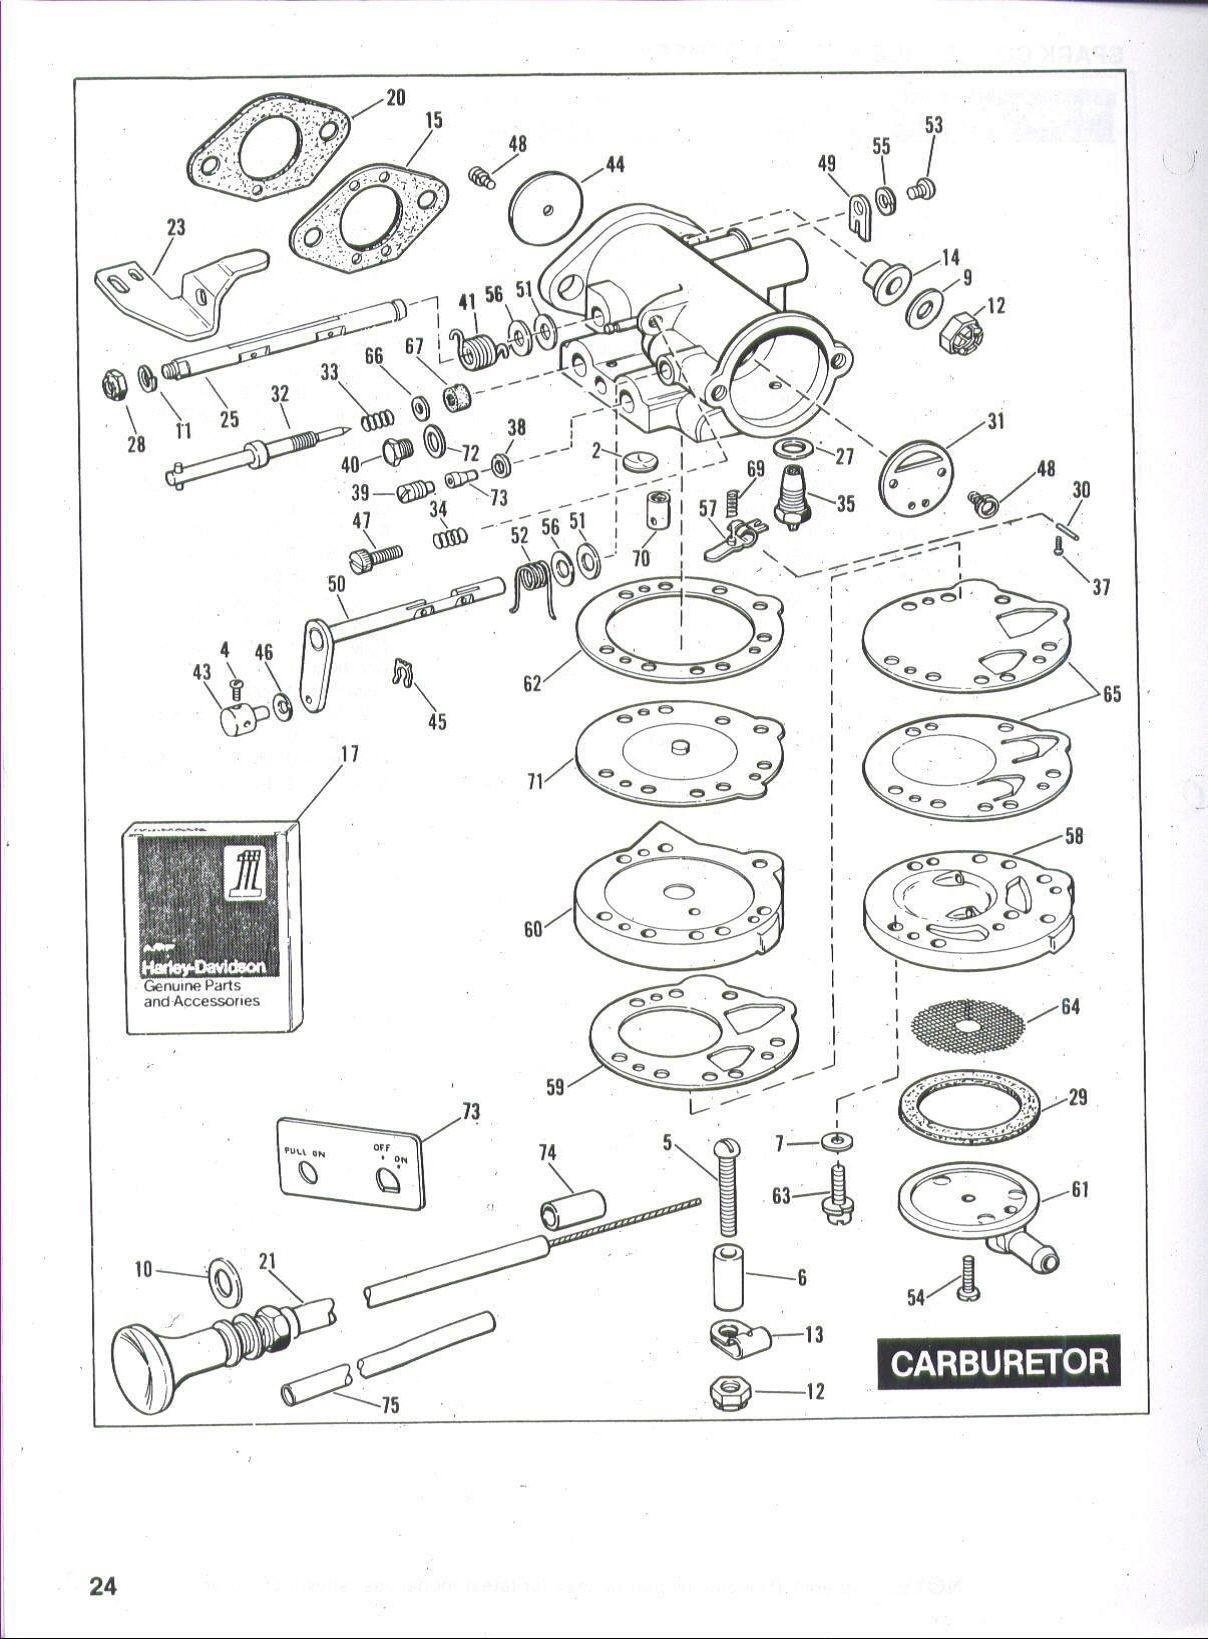 club car ds parts diagram car diagram remarkable club car